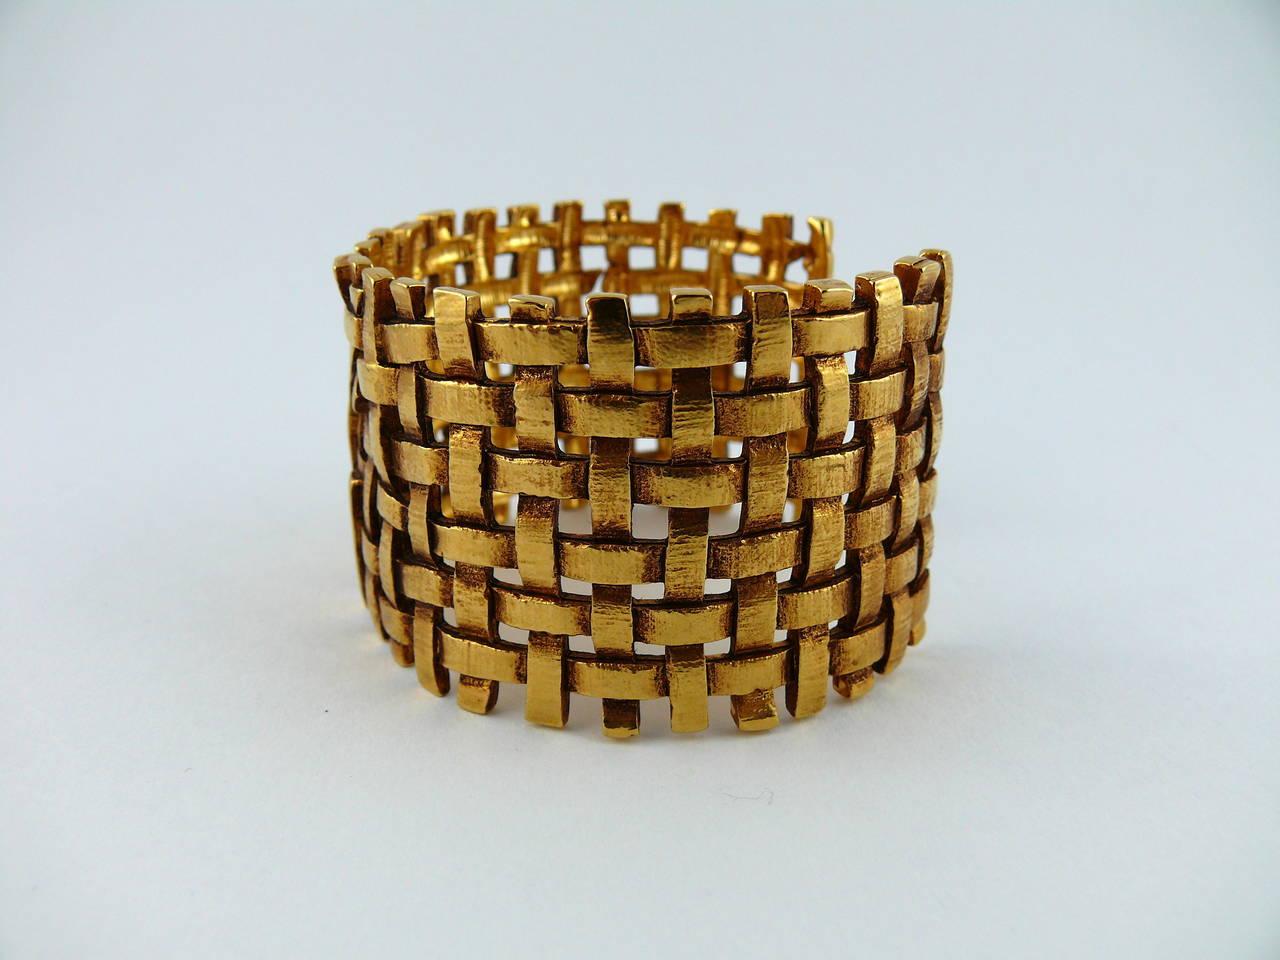 Yves Saint Laurent YSL Vintage Gold Toned Woven Cuff Bracelet For Sale 1